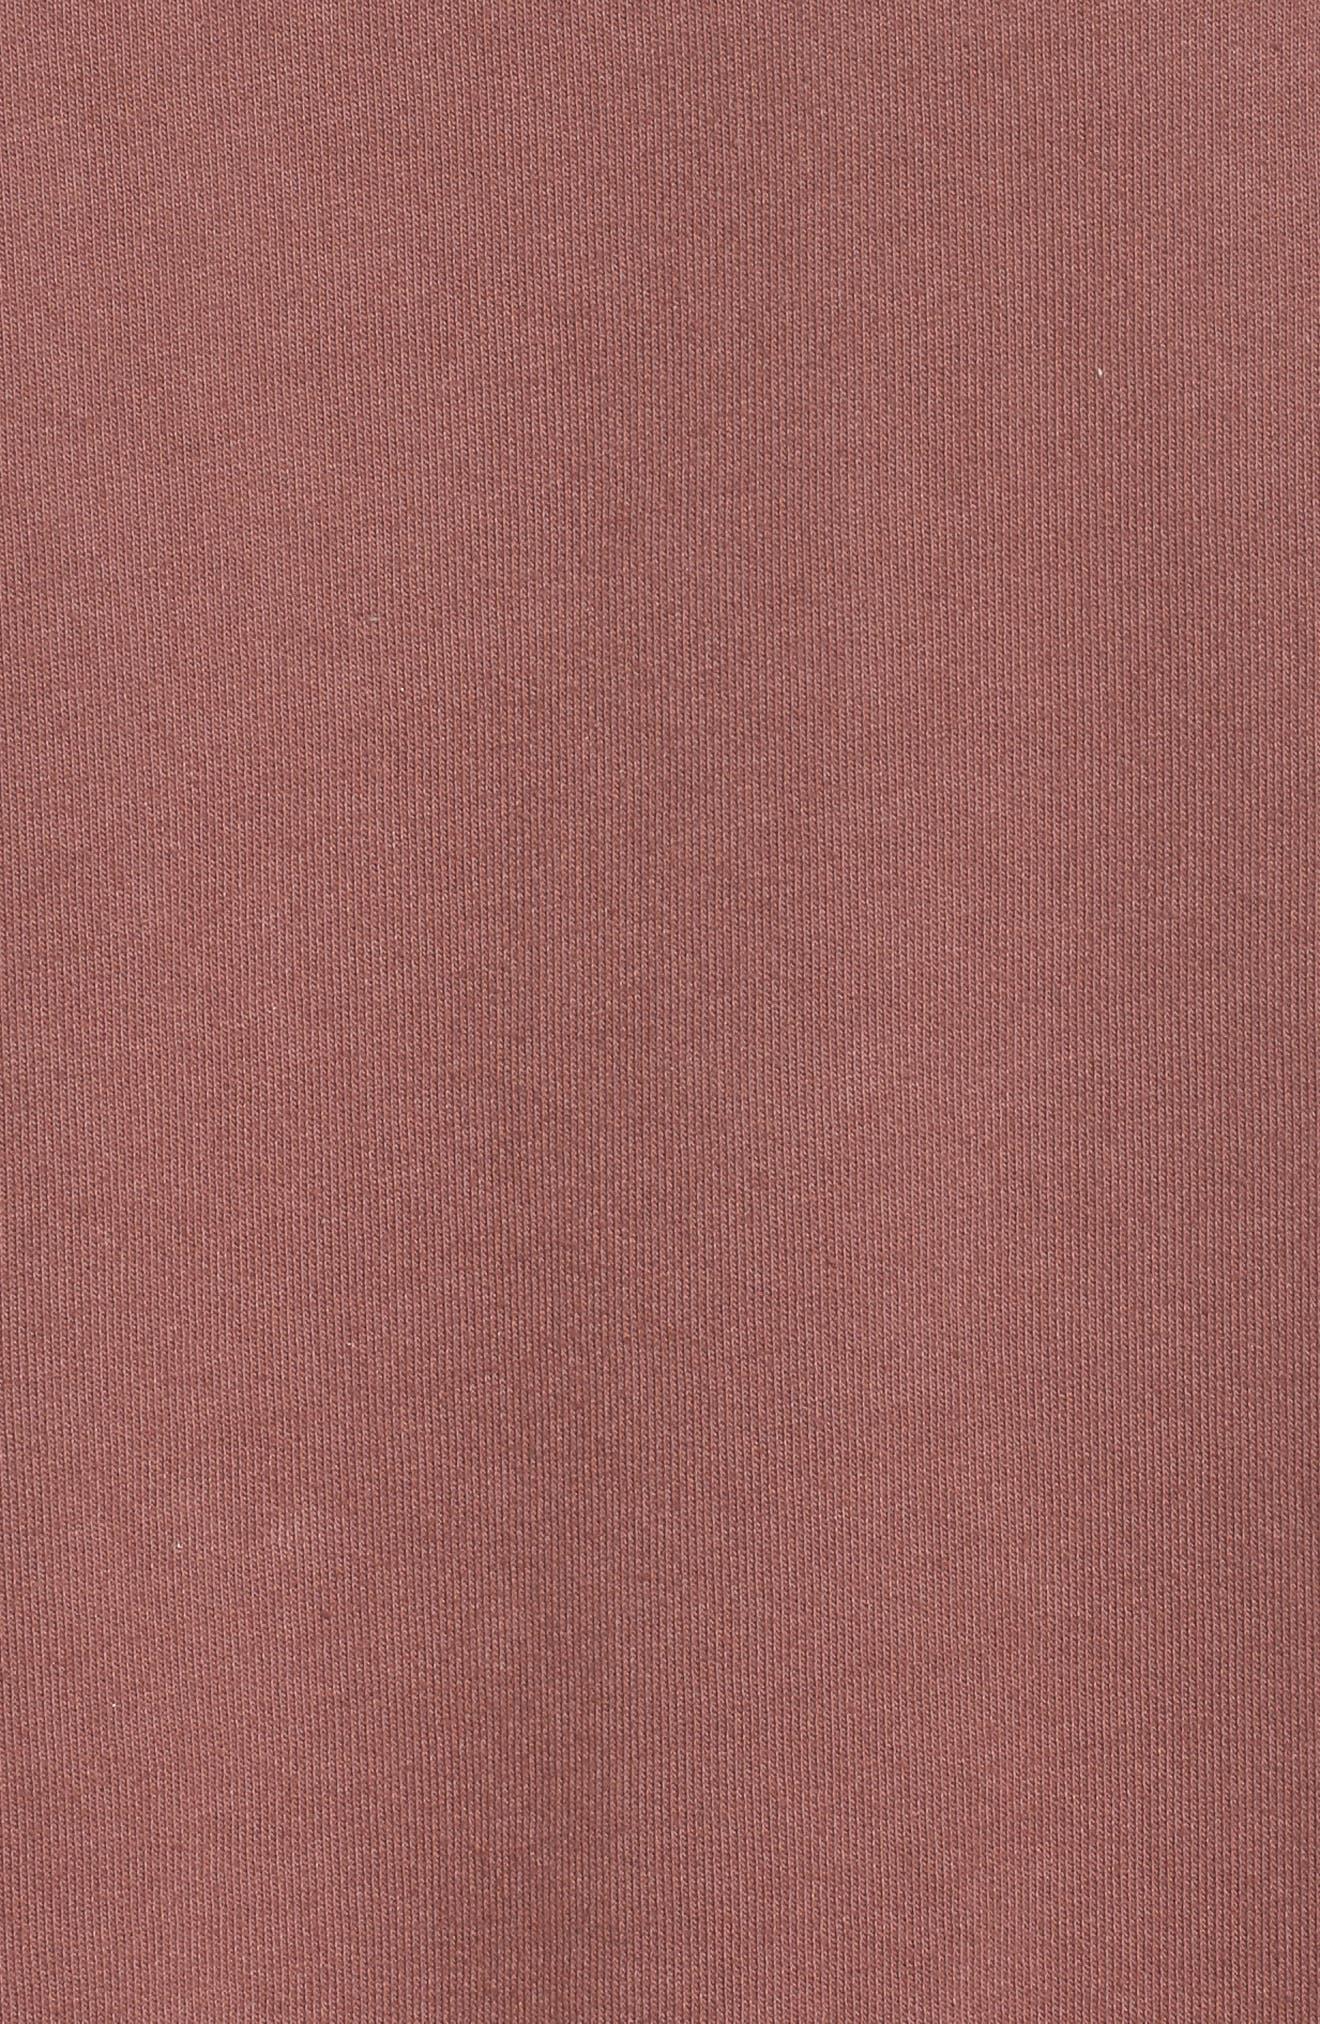 Ellstan Oversize Boyfriend Sweatshirt,                             Alternate thumbnail 10, color,